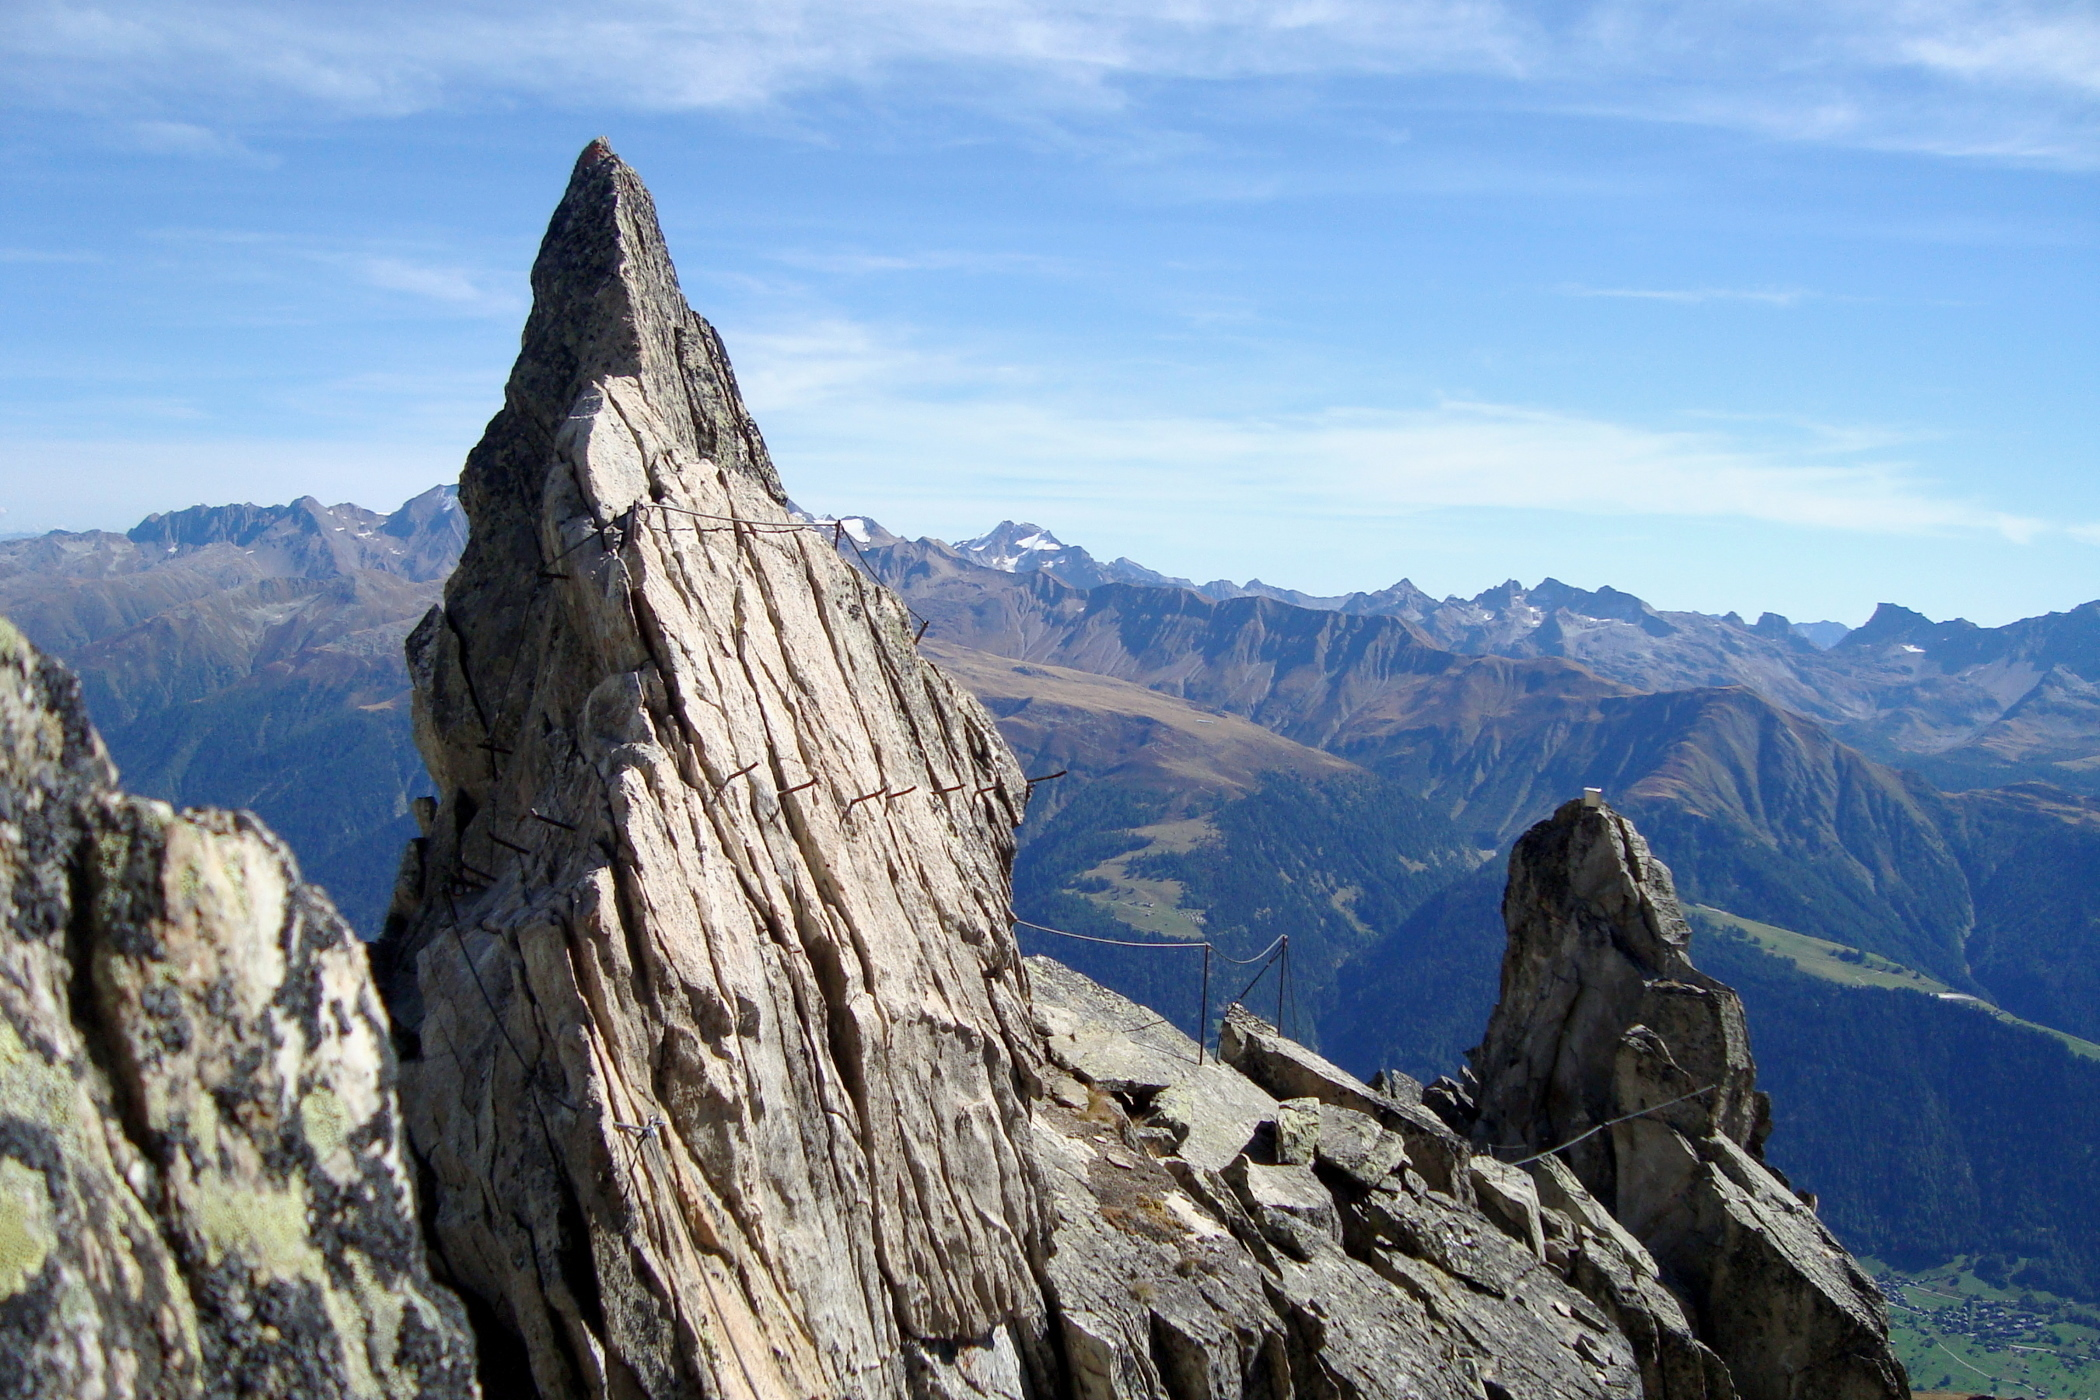 Klettersteig Eggishorn : Klettersteig eggishorn